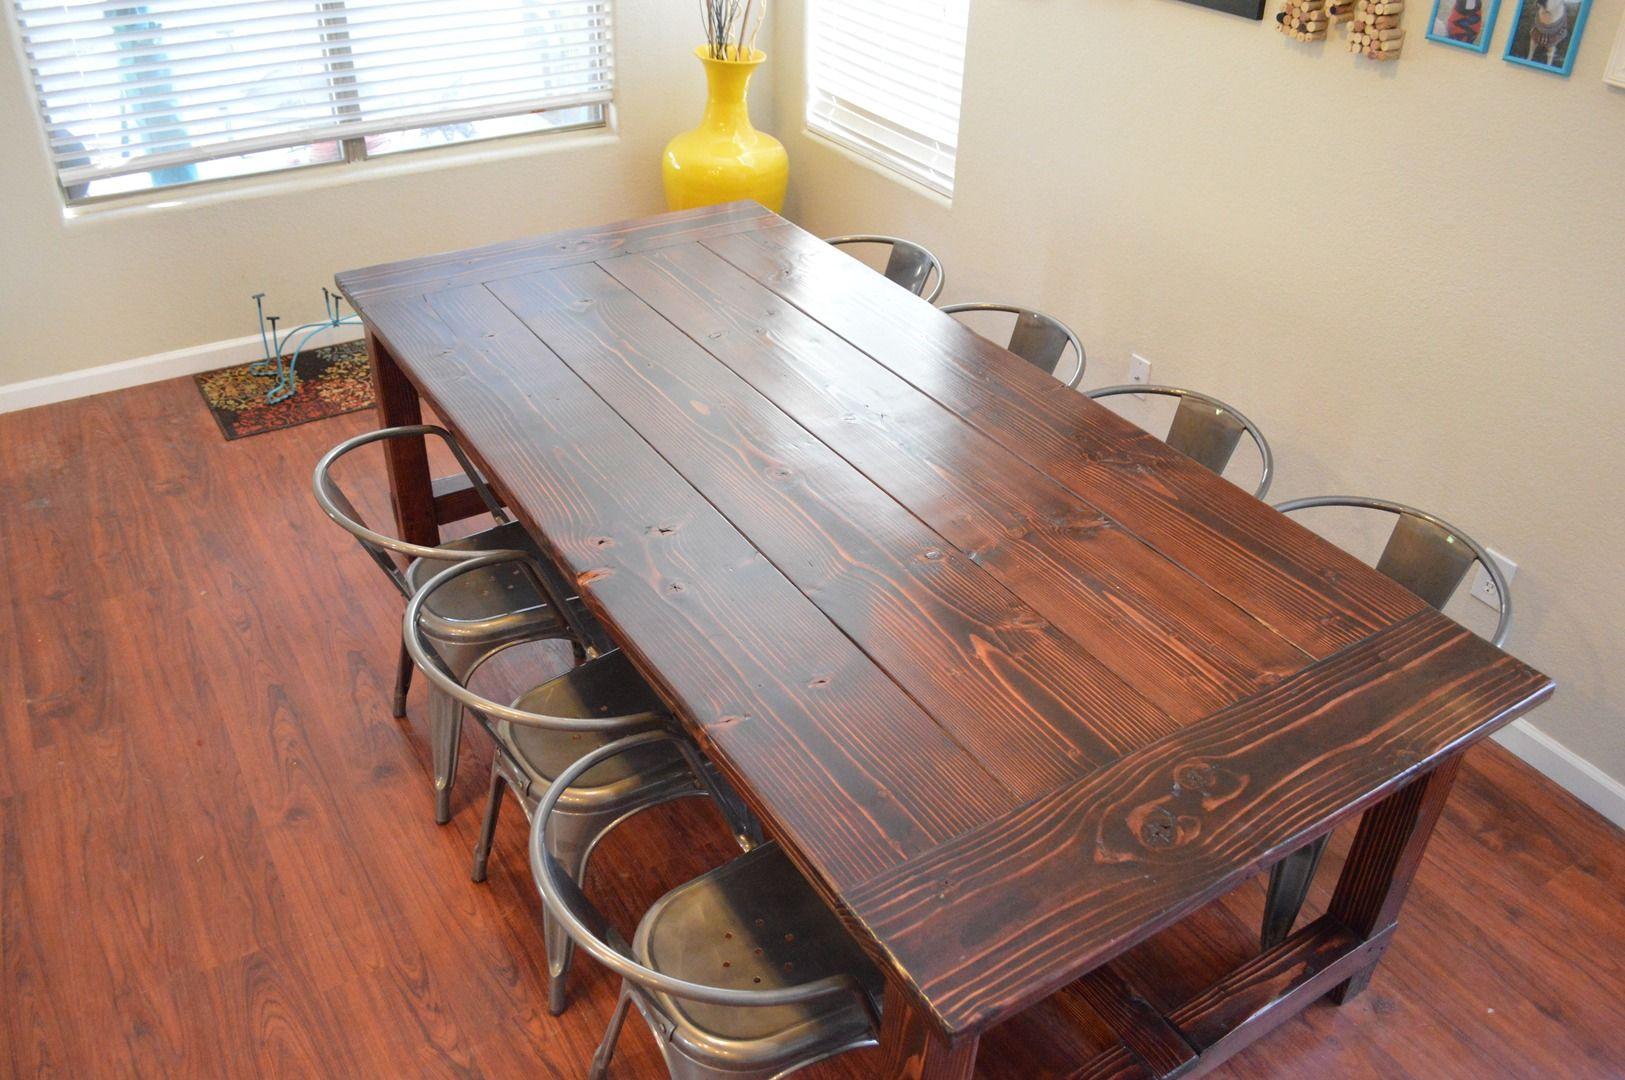 Custom Built Wood Kitchen Tablefarmhouse Style Country Chic Adorable Custom Built Dining Room Tables 2018